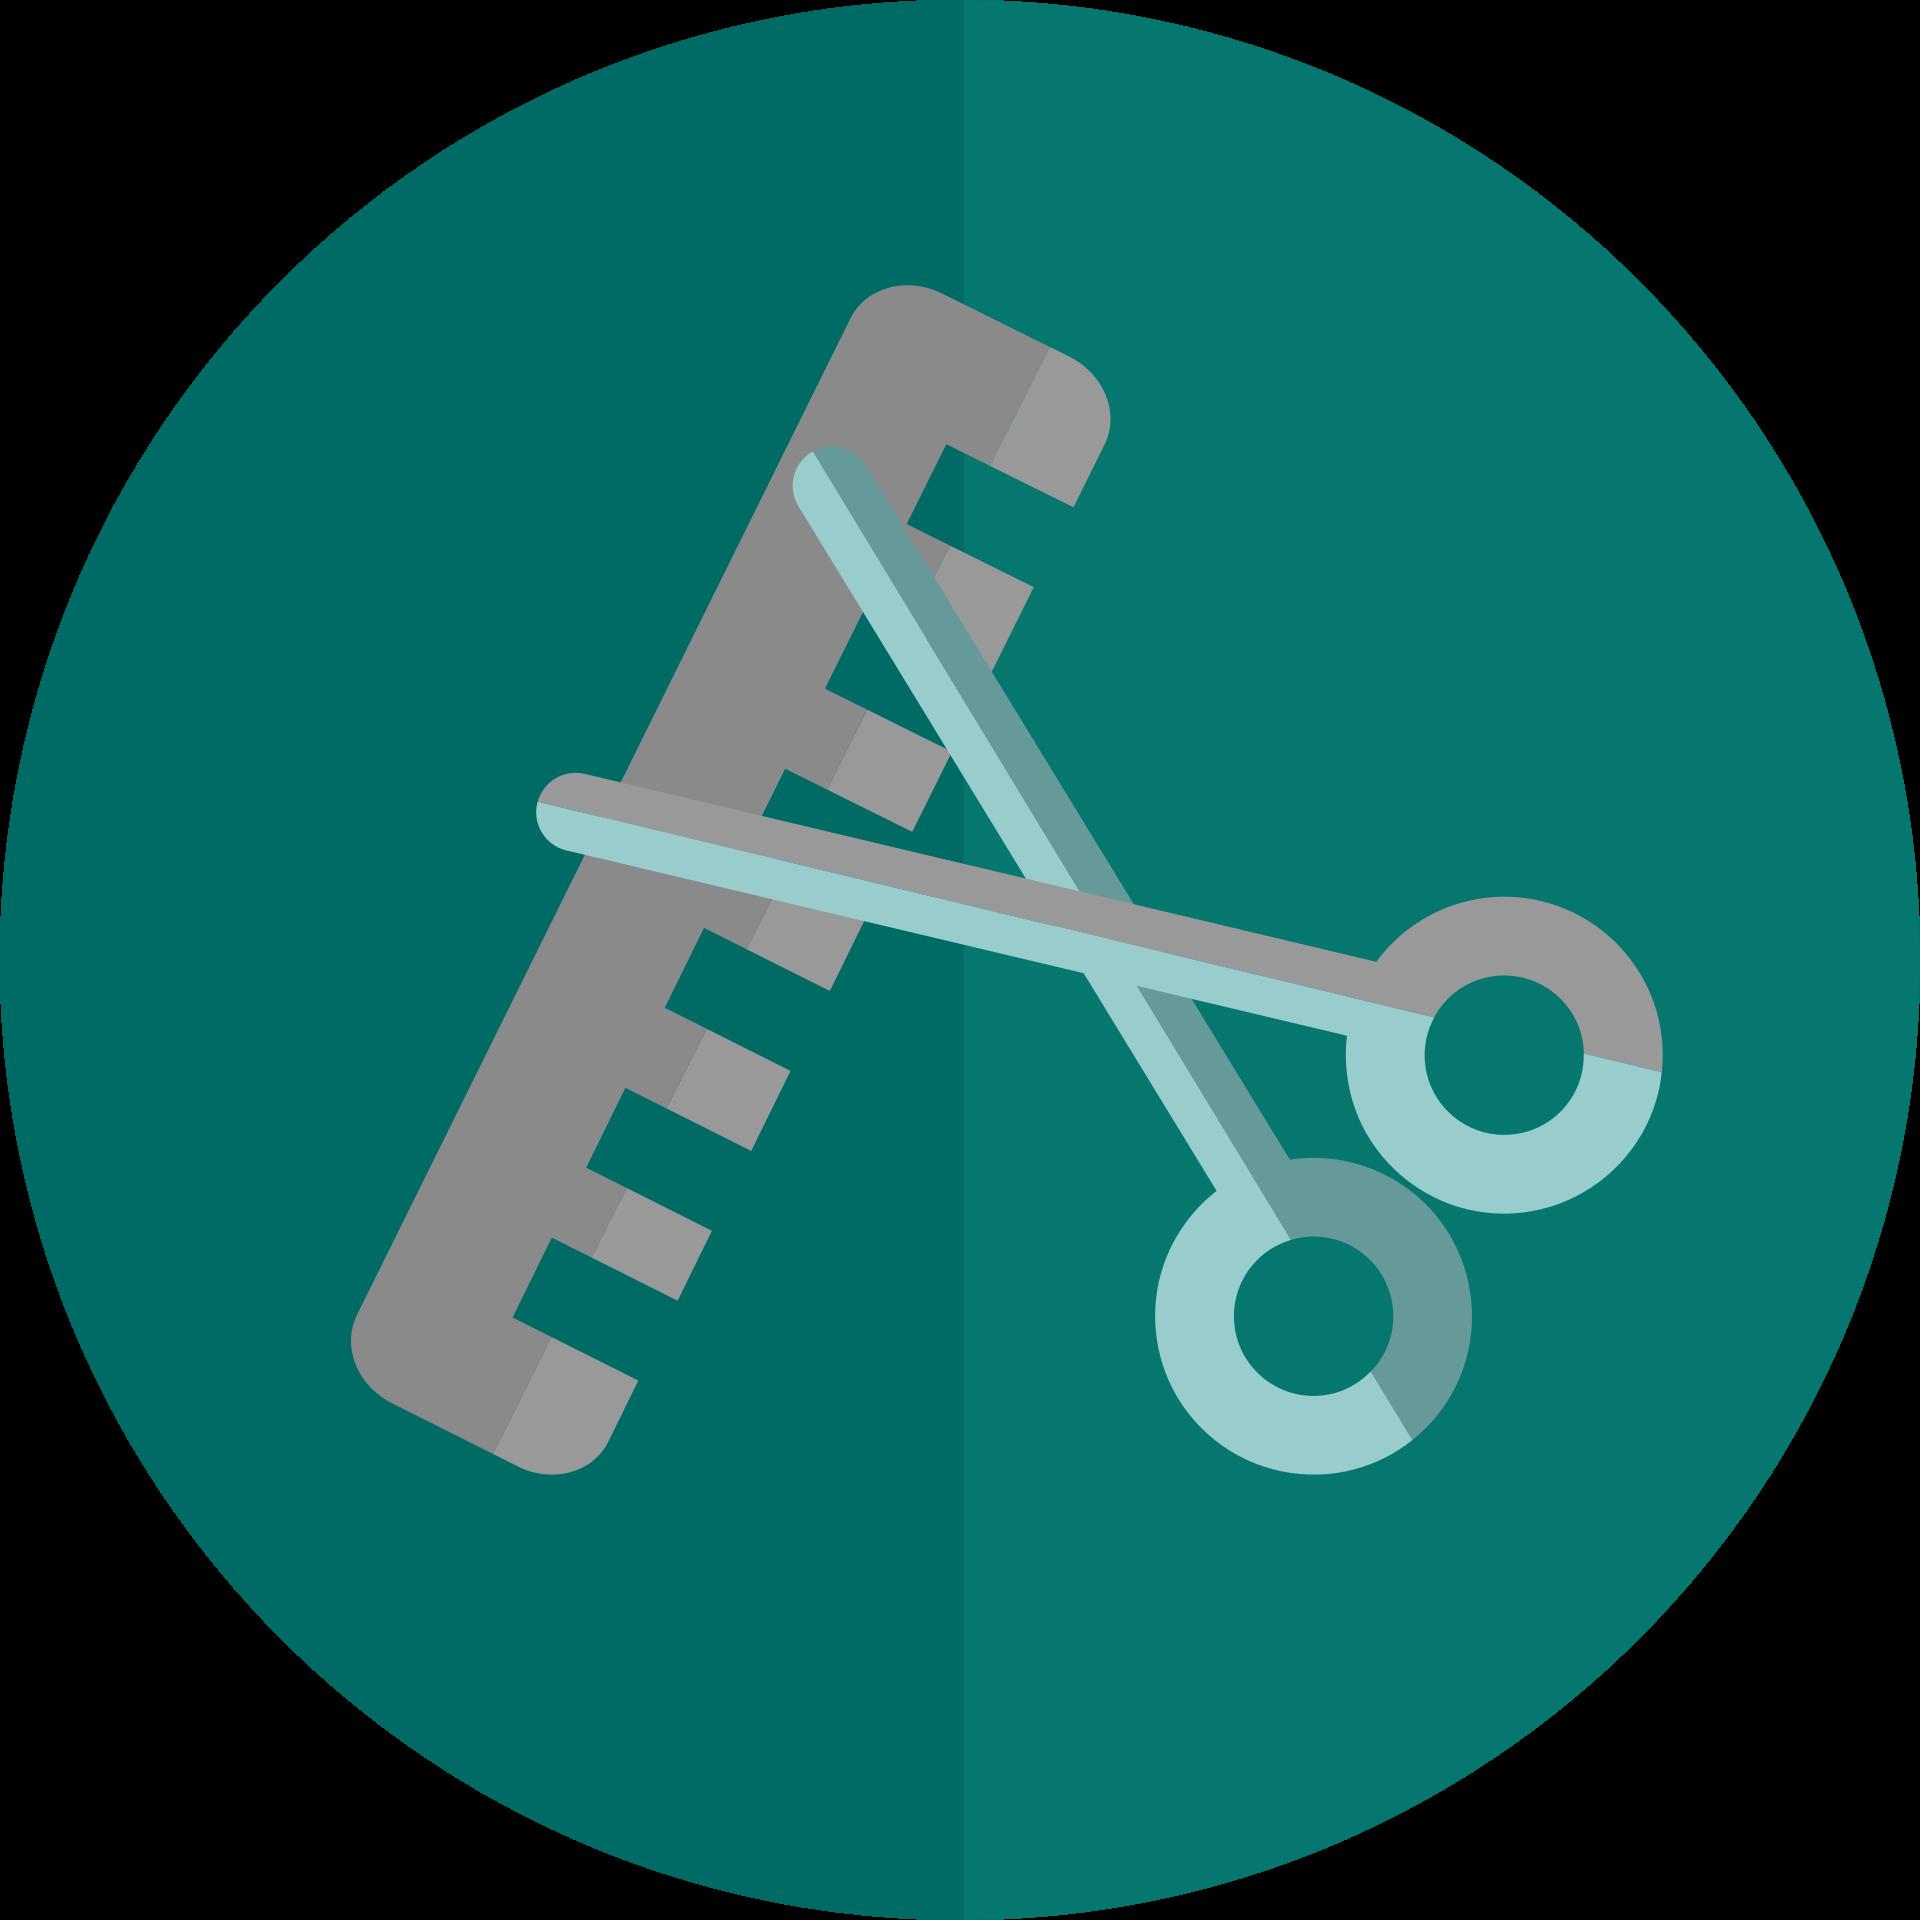 Scissor Comb logo PNG Image